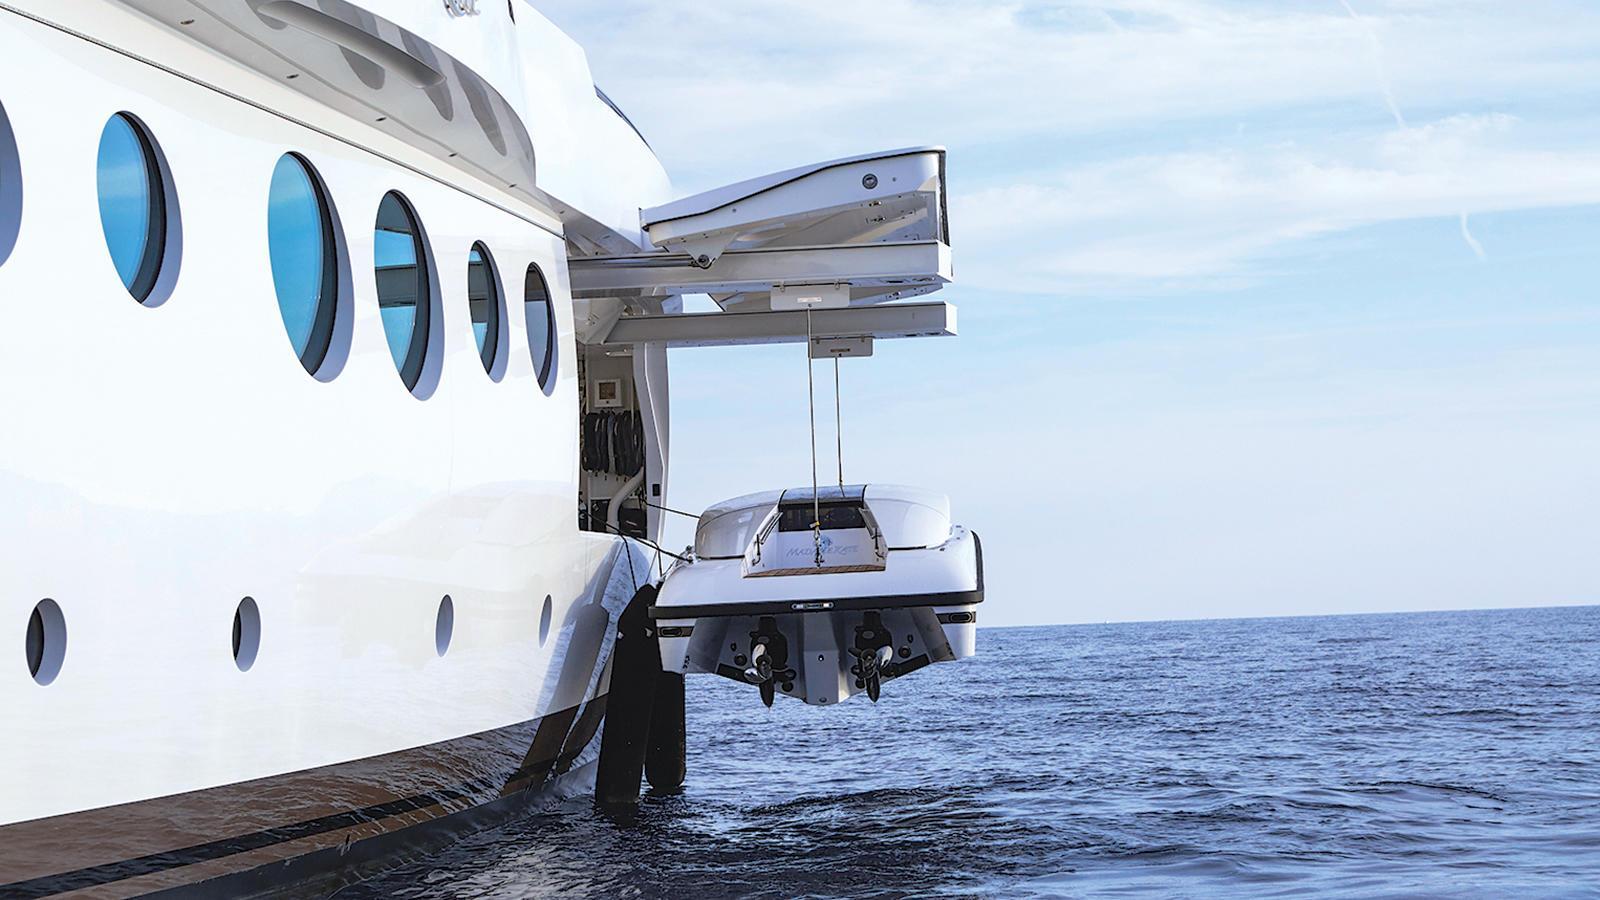 madame-kate-motor-yacht-amels-1999-62m-2015-tender